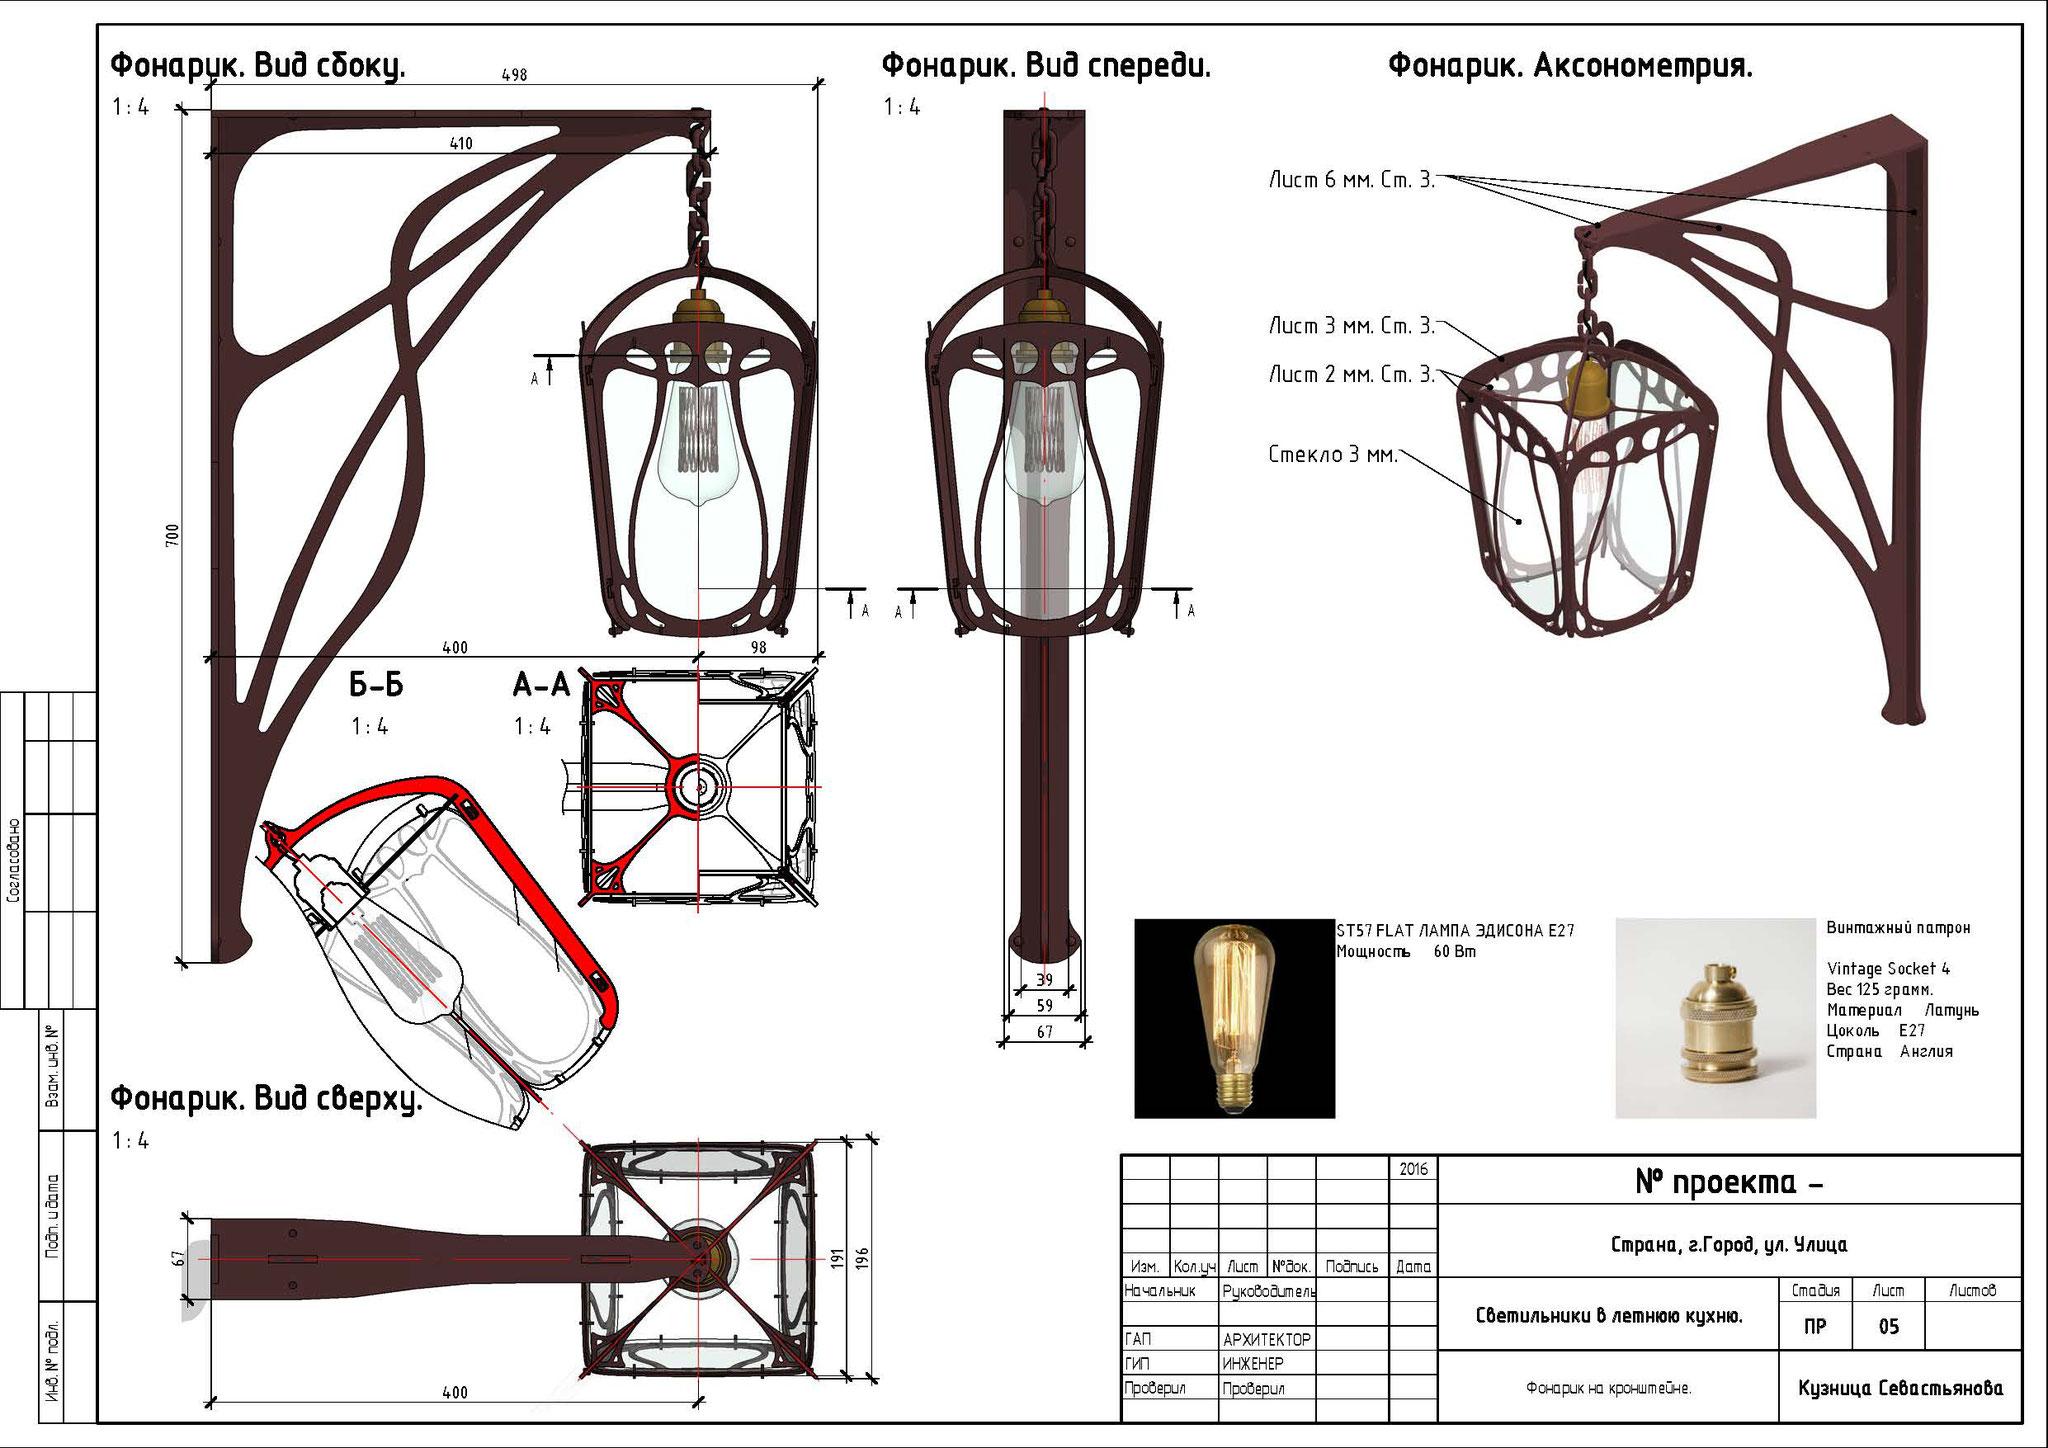 Дизайн- проект светильника в стиле модерн.